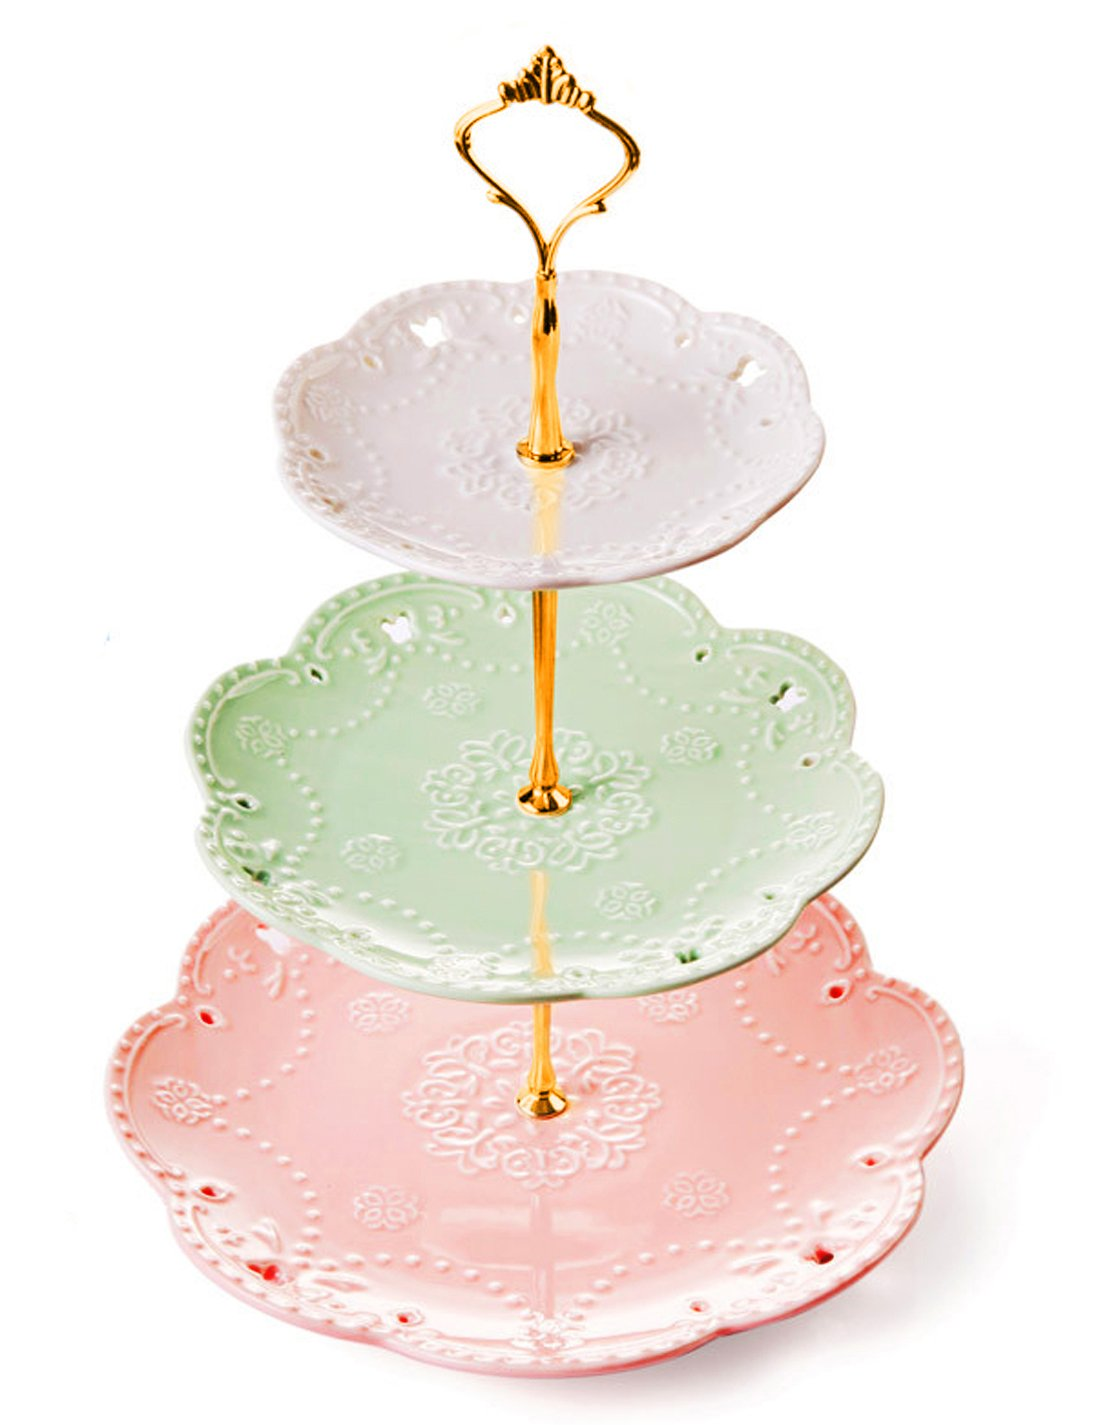 Jusalpha 3-tier Ceramic Cake Stand-Dessert Stand-Cupcake Stand-Tea Party Serving Platter (Gold)